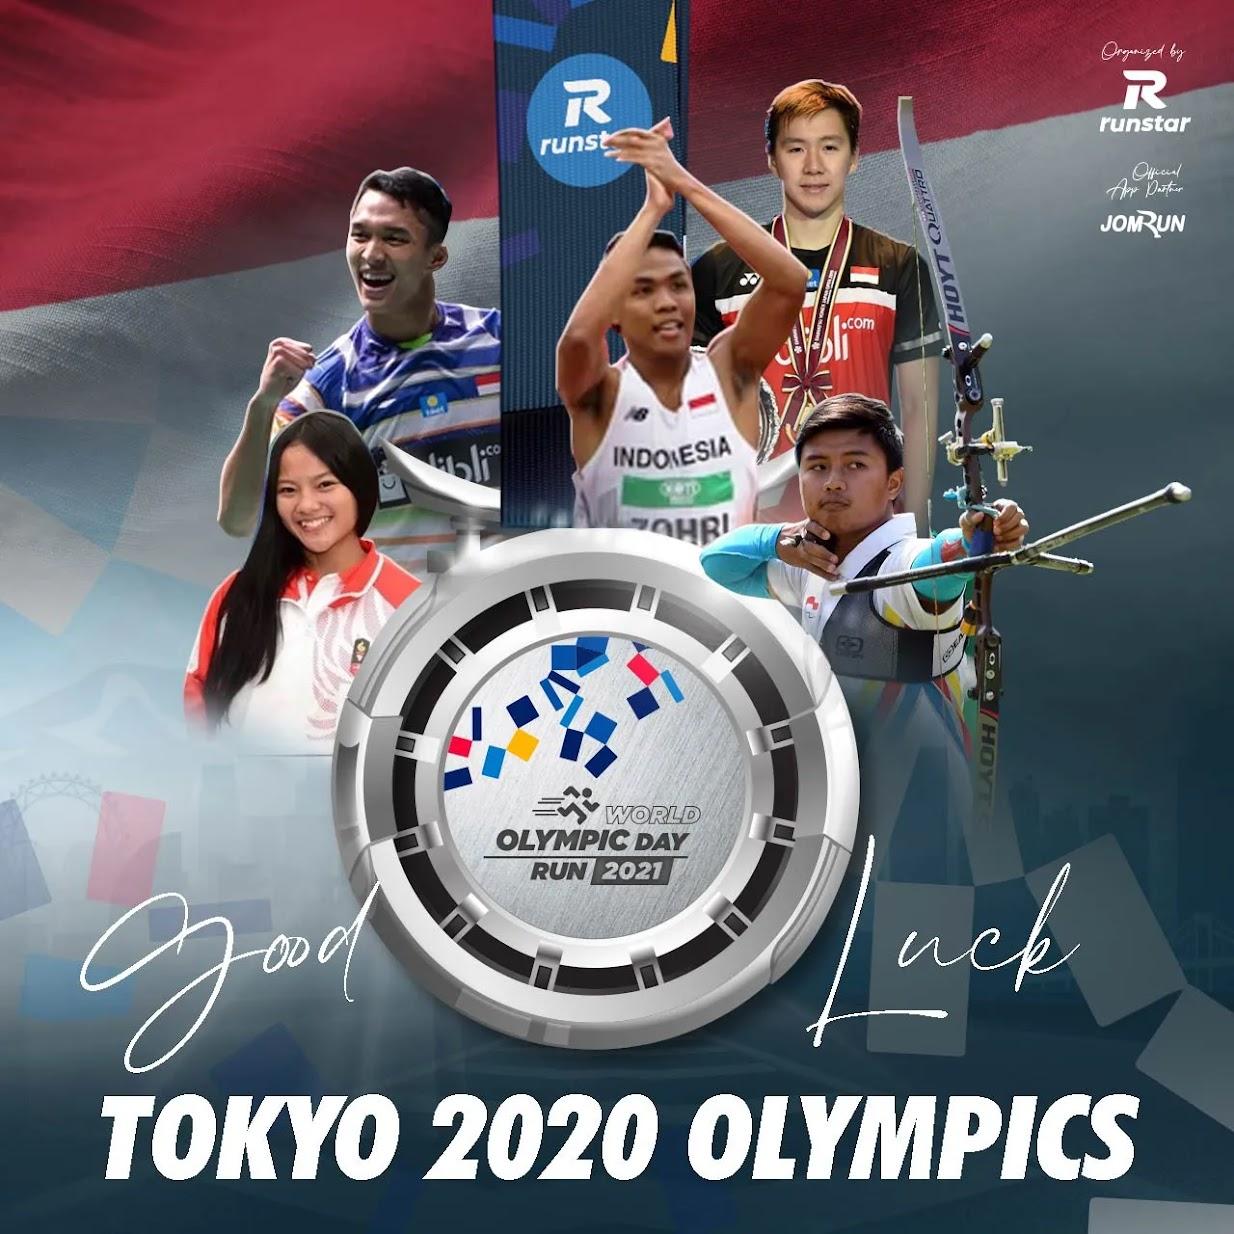 World Olympic Day Virtual Run • 2021